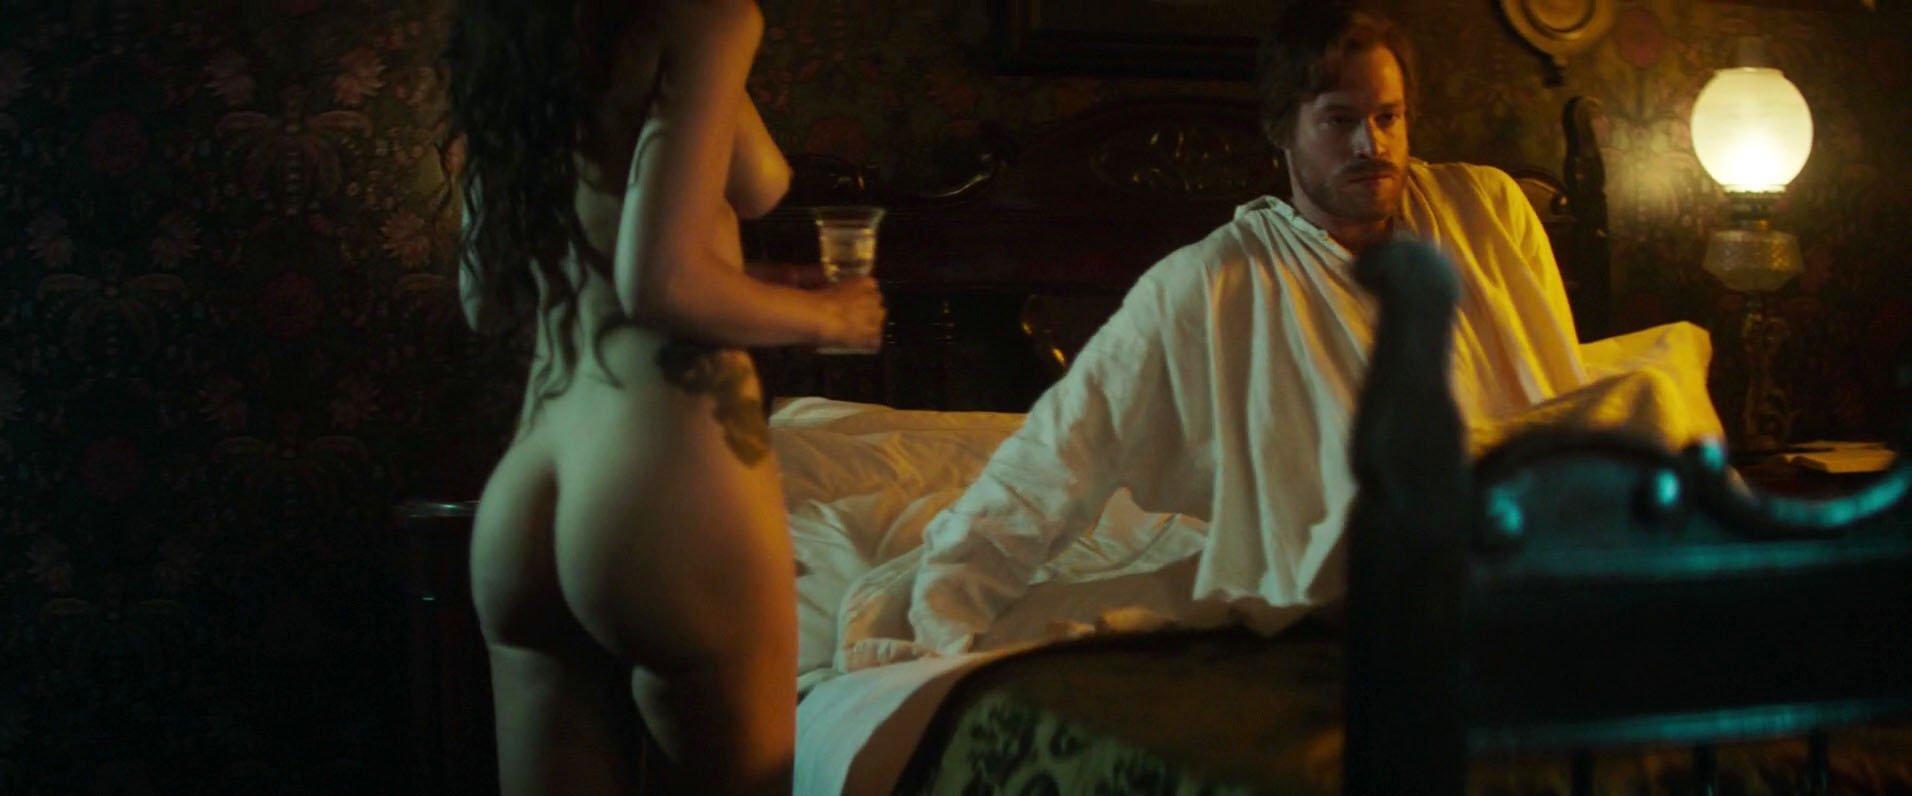 Maria Valverde nude - The Limehouse Golem (2016)